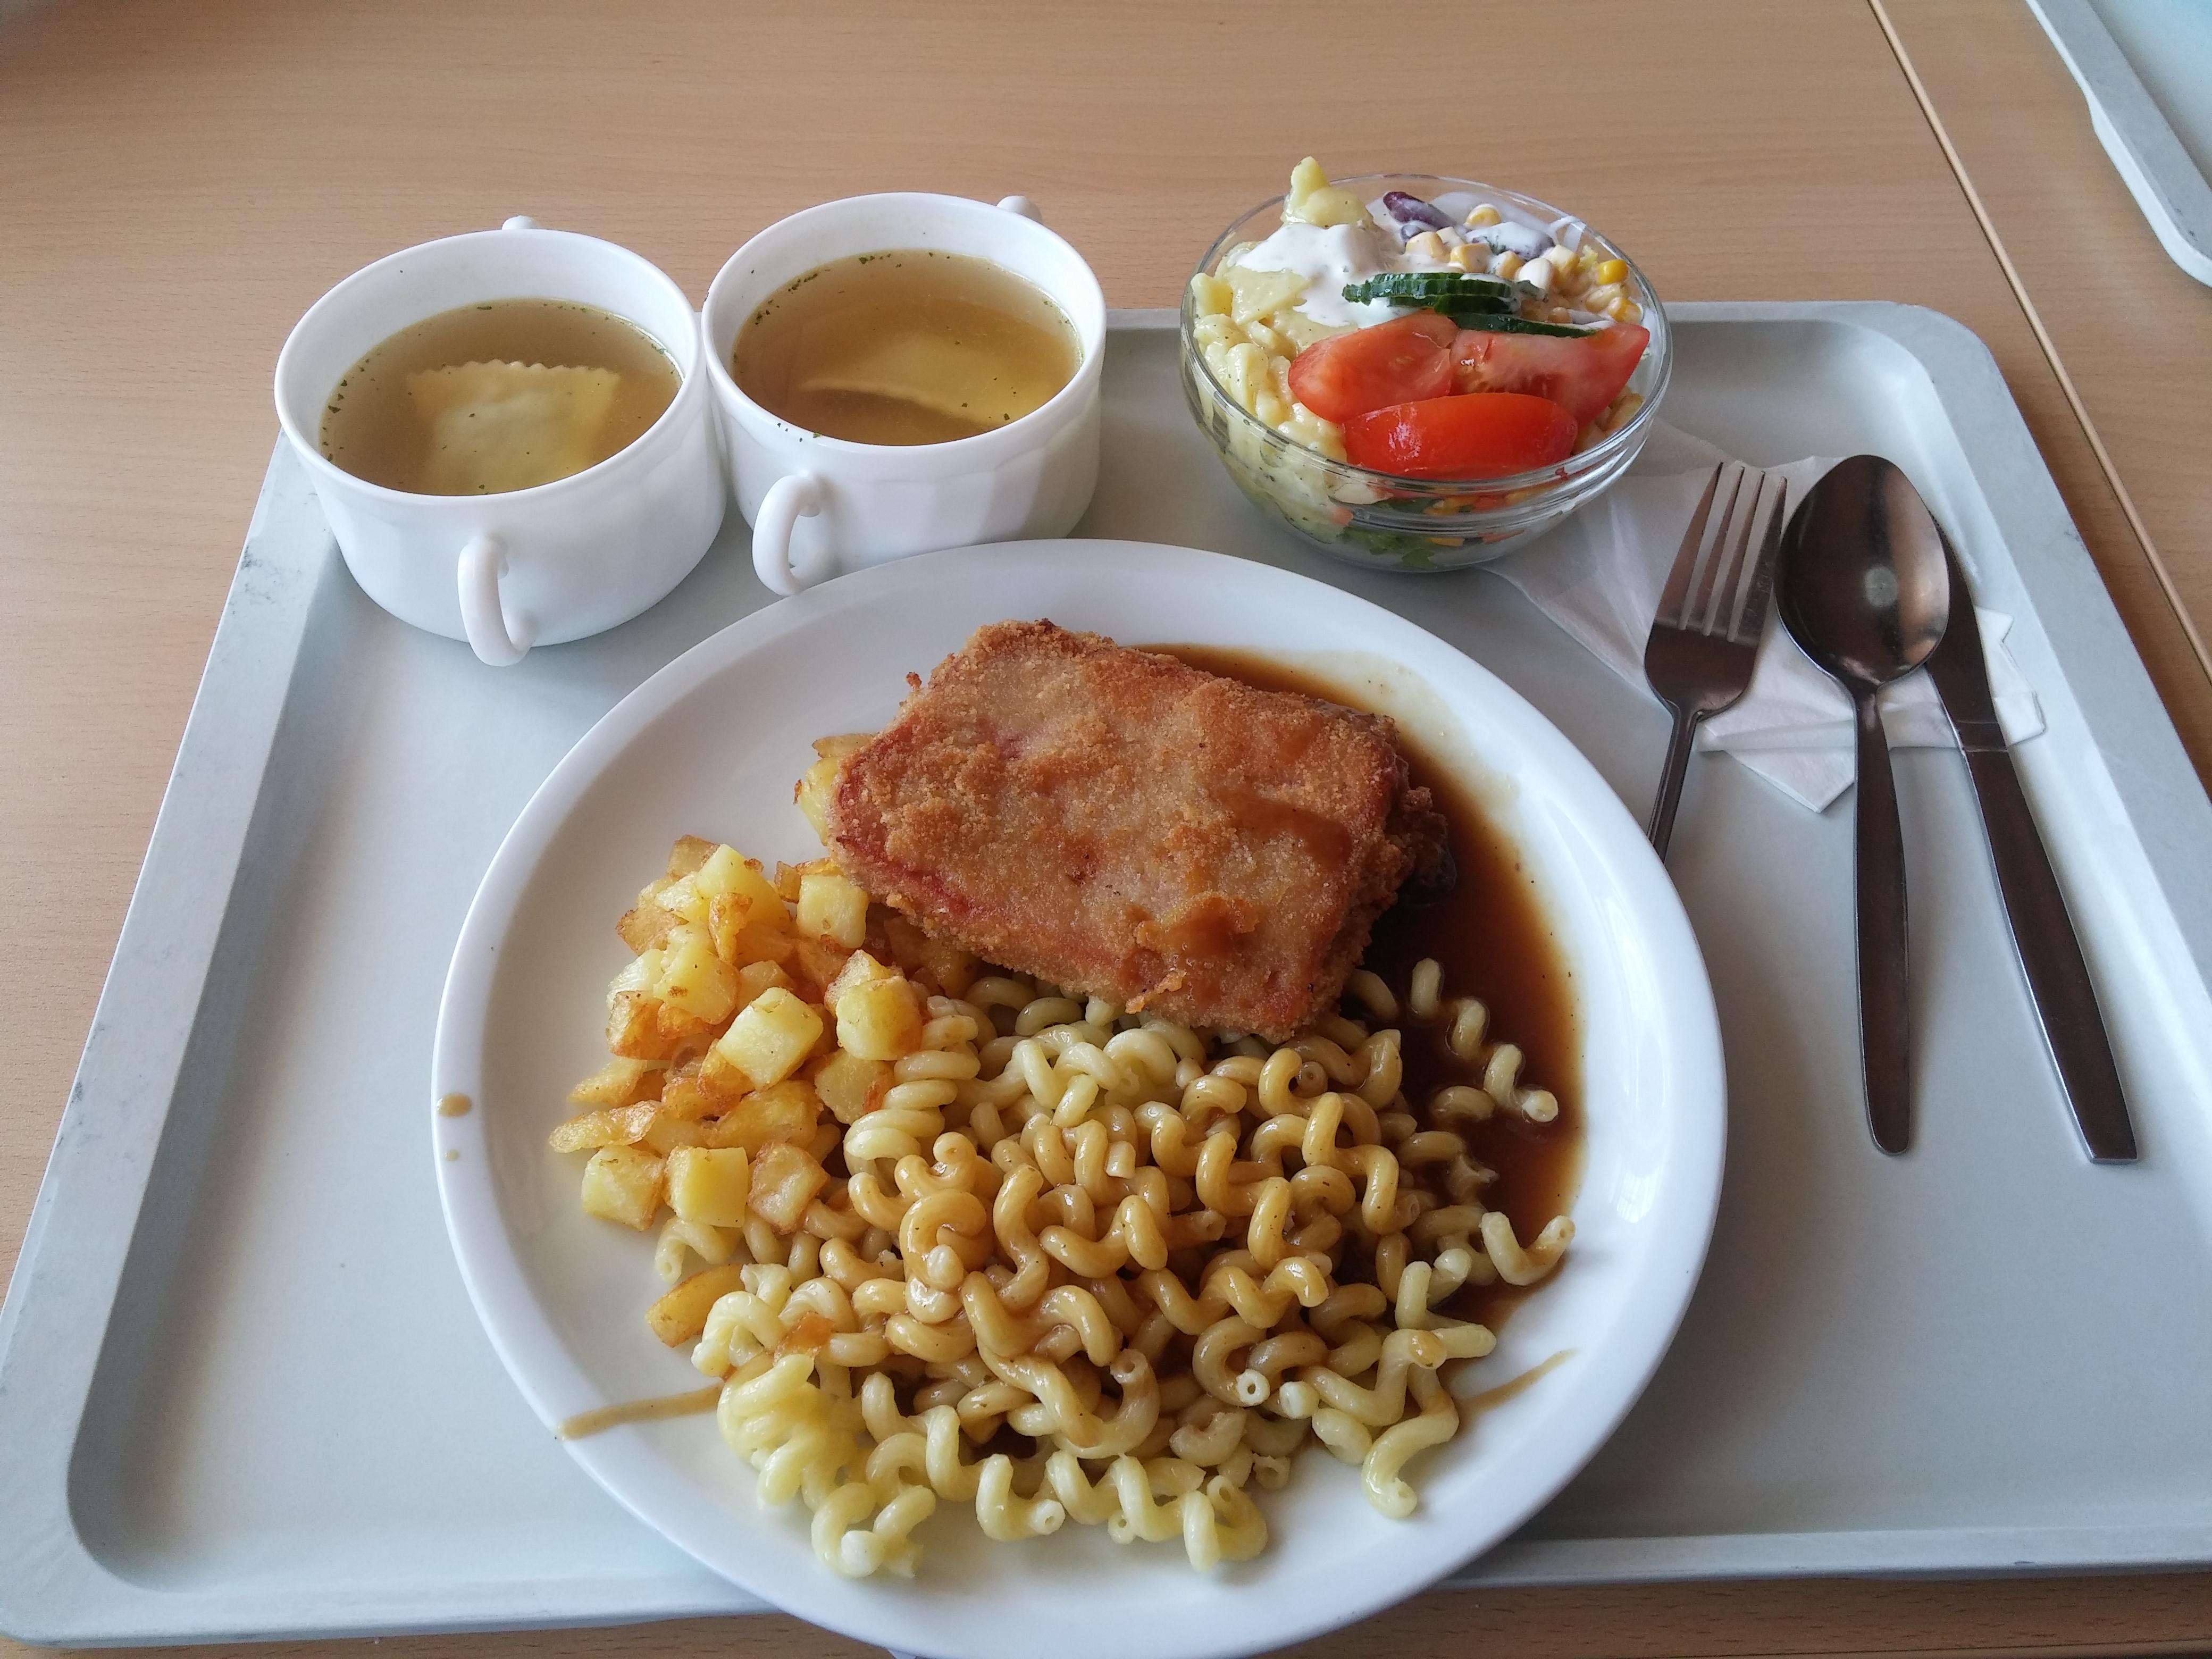 https://foodloader.net/nico_2015-07-10_fleisch-nudeln-bratkartoffeln-suppen-salat.jpg